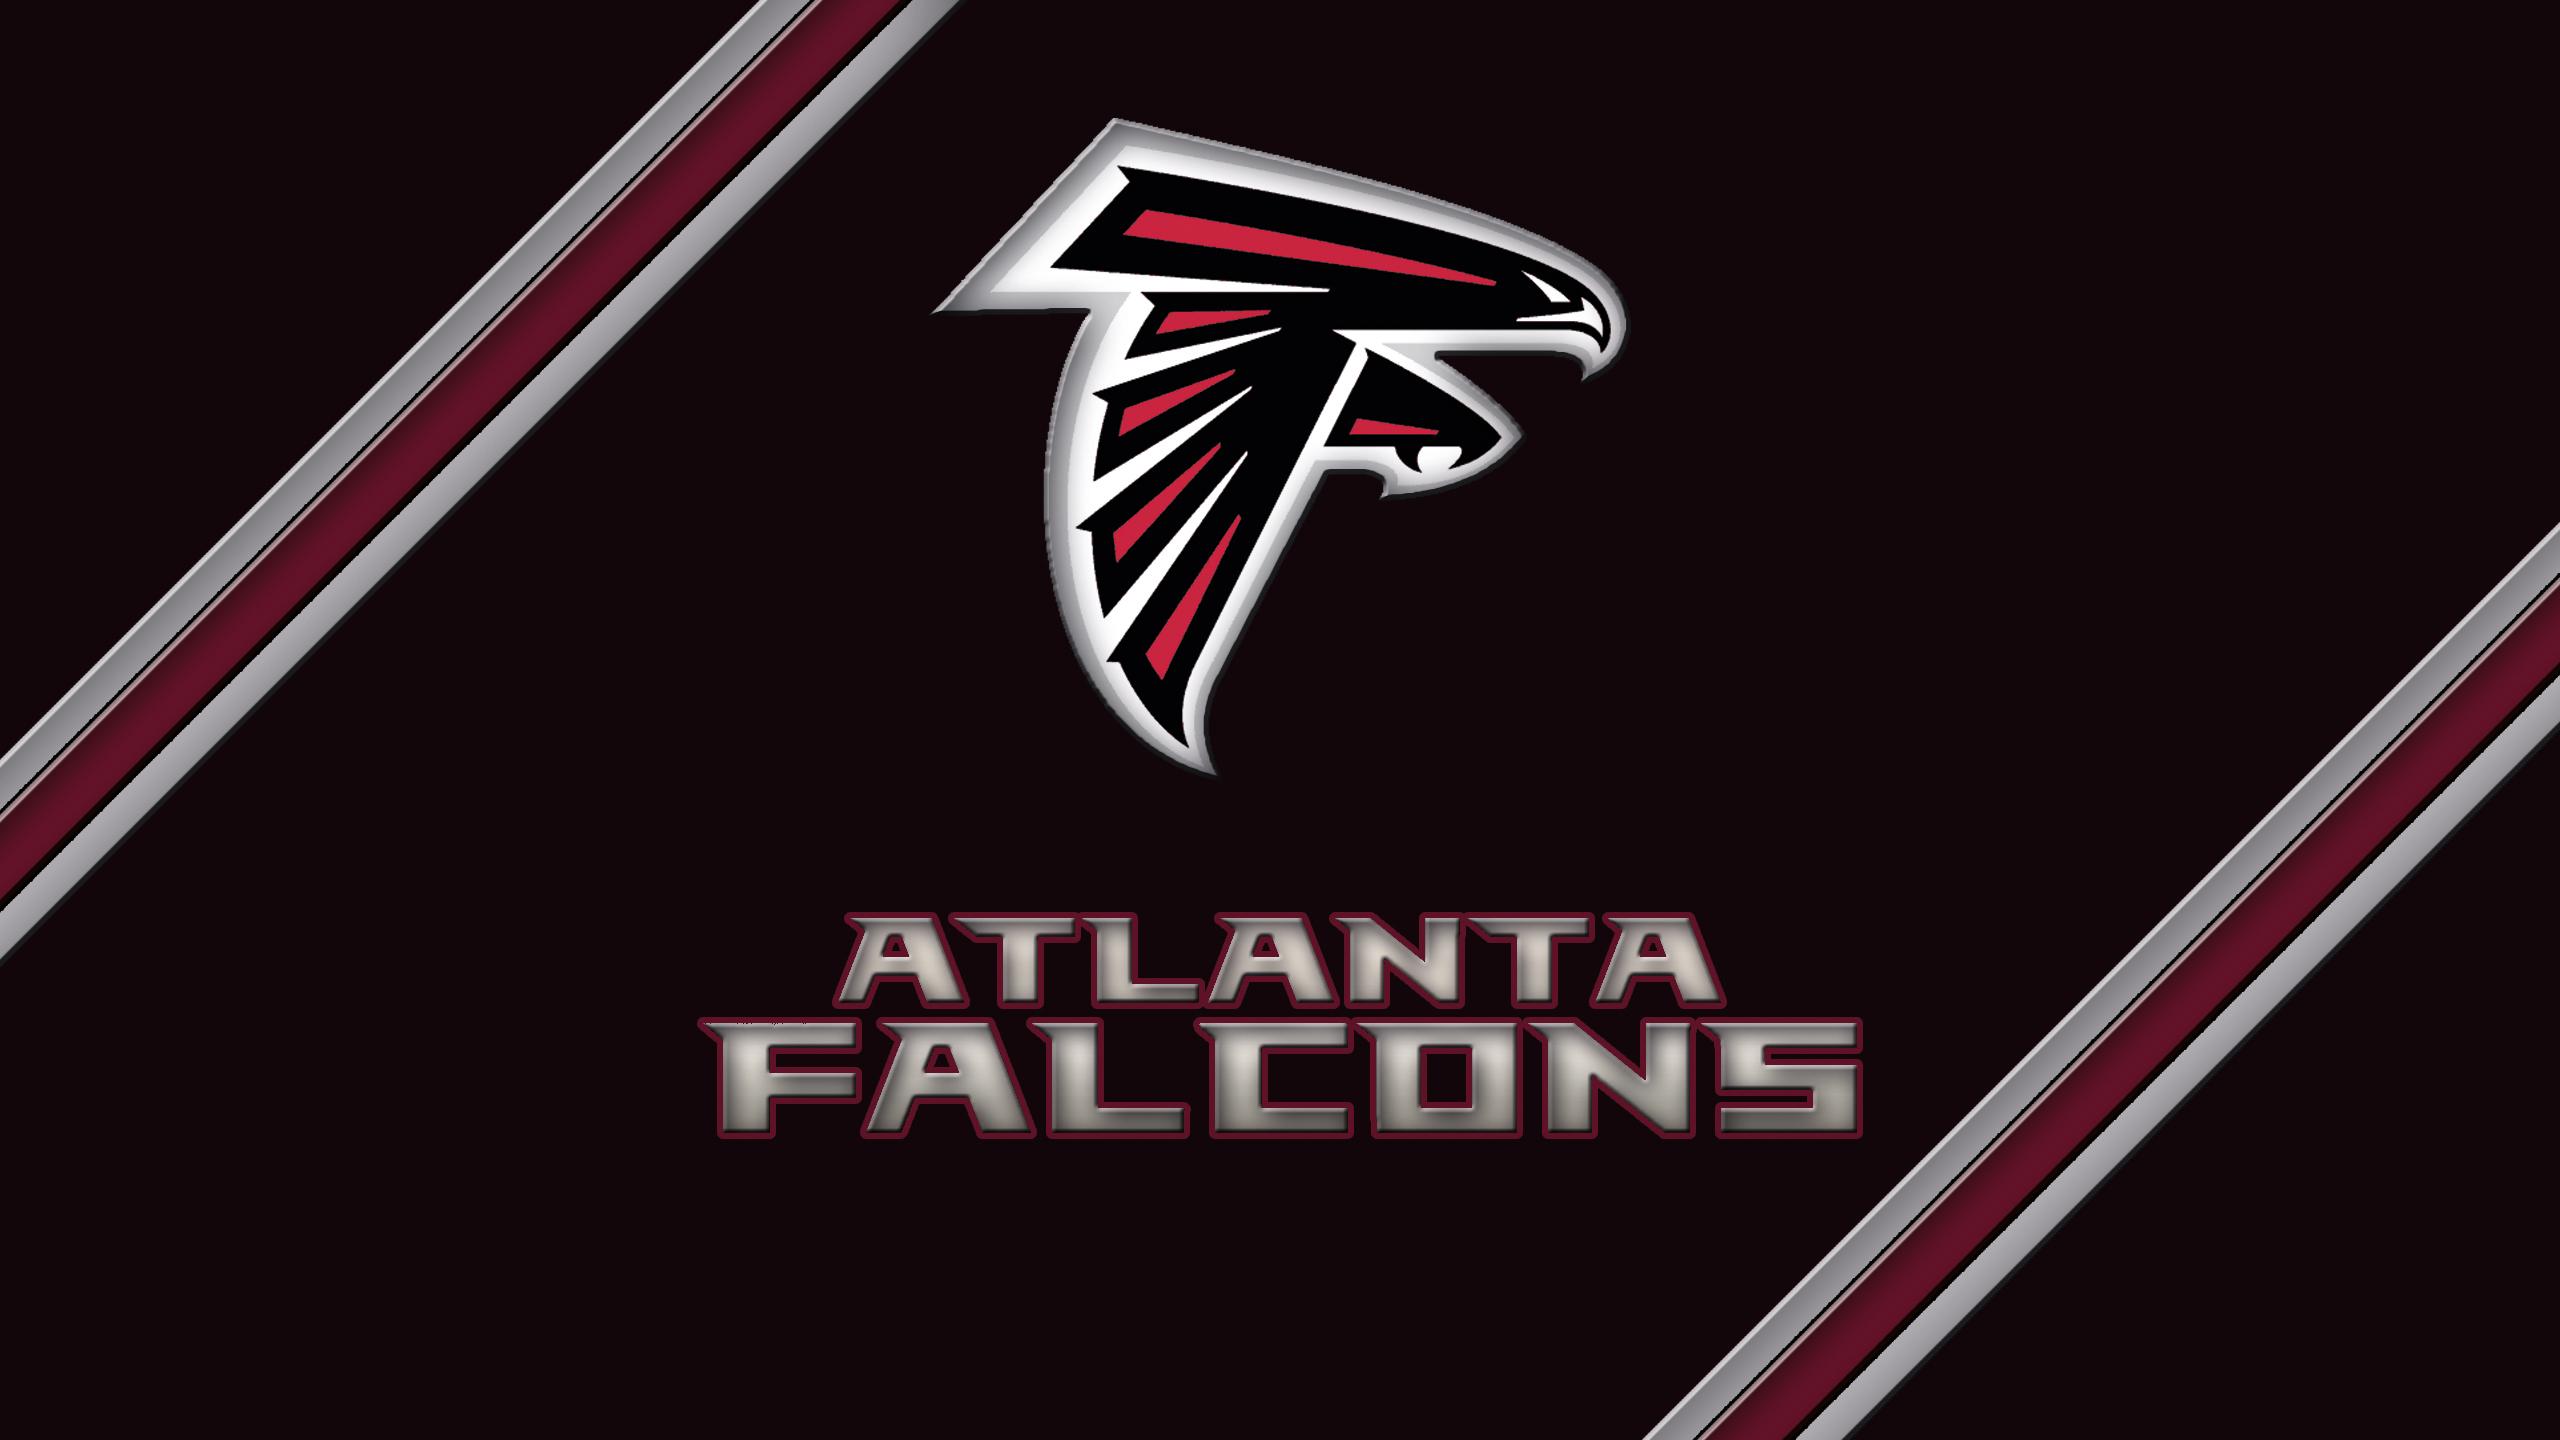 Atlanta Falcons 2018 Wallpaper Hd 64 Images: Atlanta Falcons By BeAware8 On DeviantArt